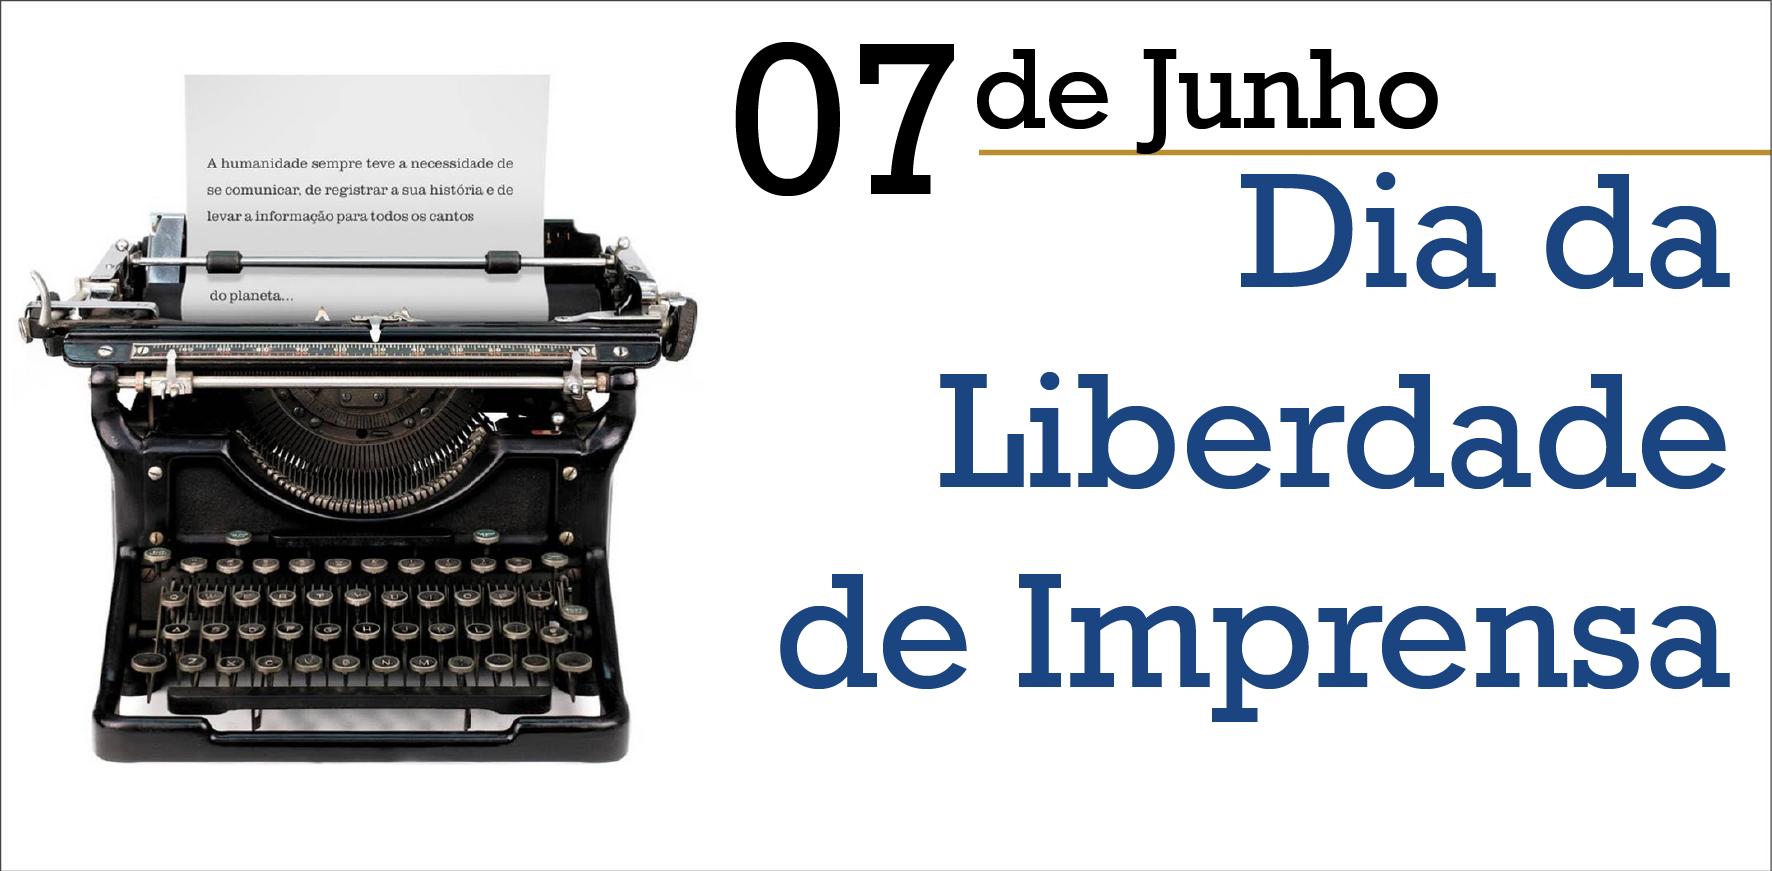 Dia da Liberdade de Imprensa 7 de junho, liberdade perigosa